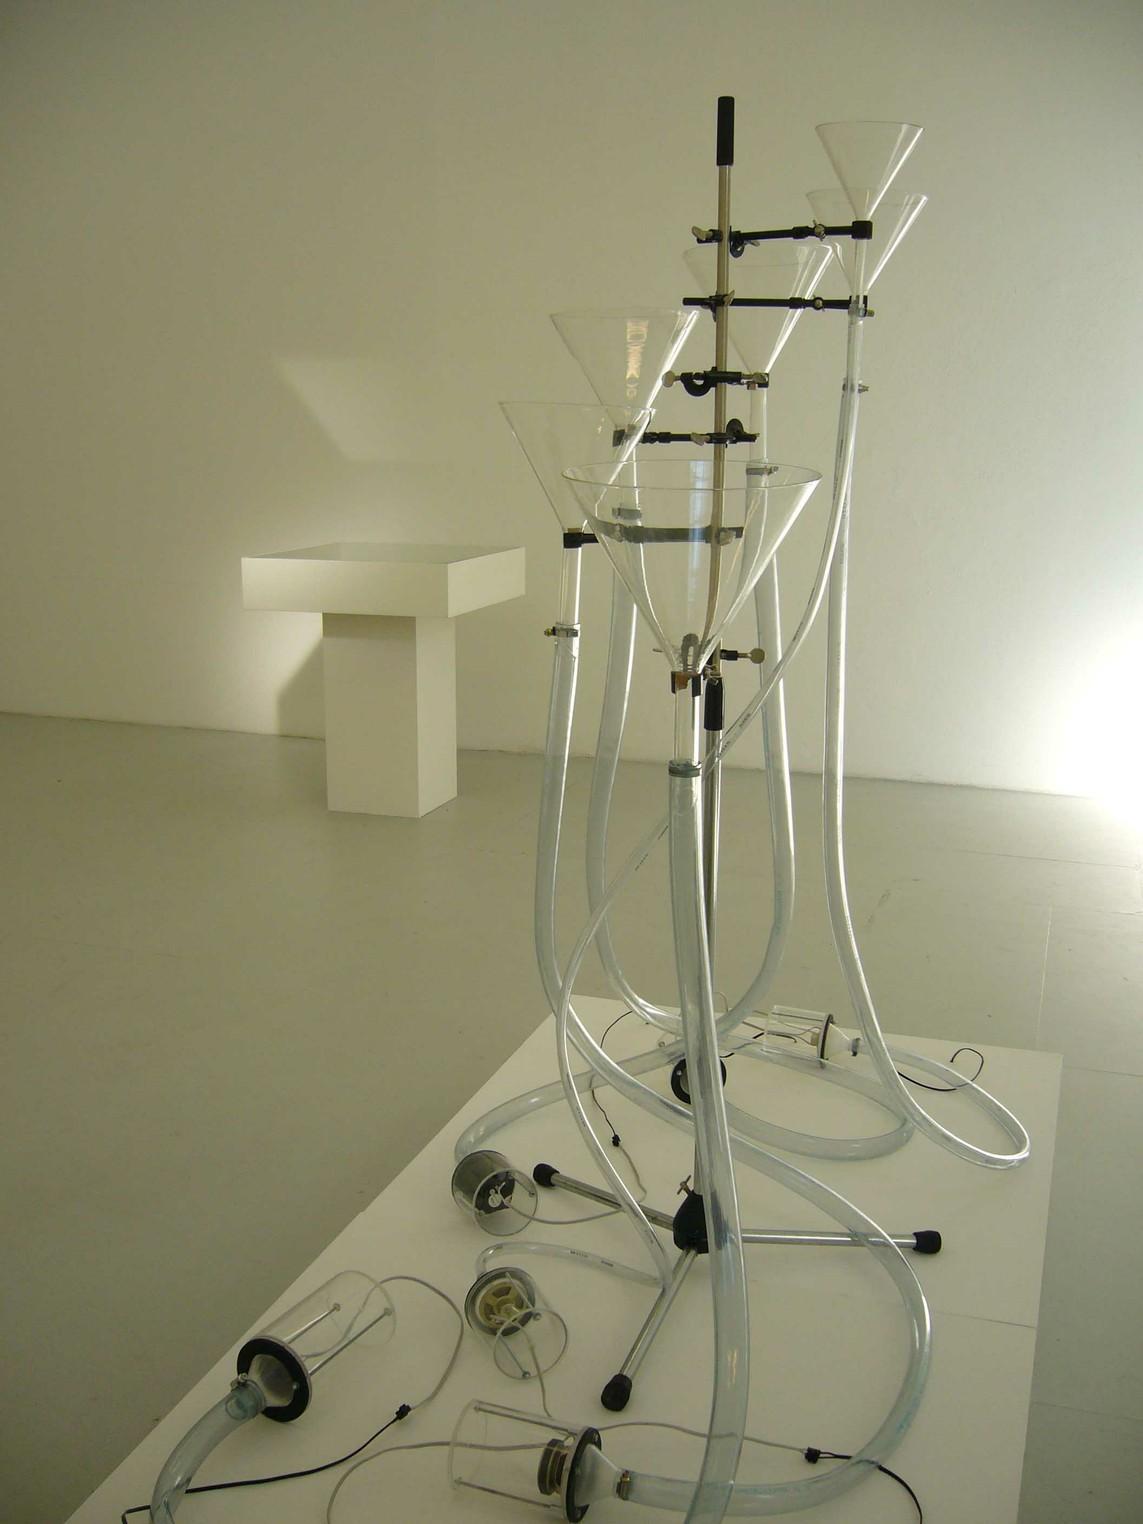 Nikolaus Heyduck und Andreas H.H. Suberg: »Trichterbaum-Infusion« / Mixed Media, Elektronik / 180 x 200 x 100 cm / 2004/05